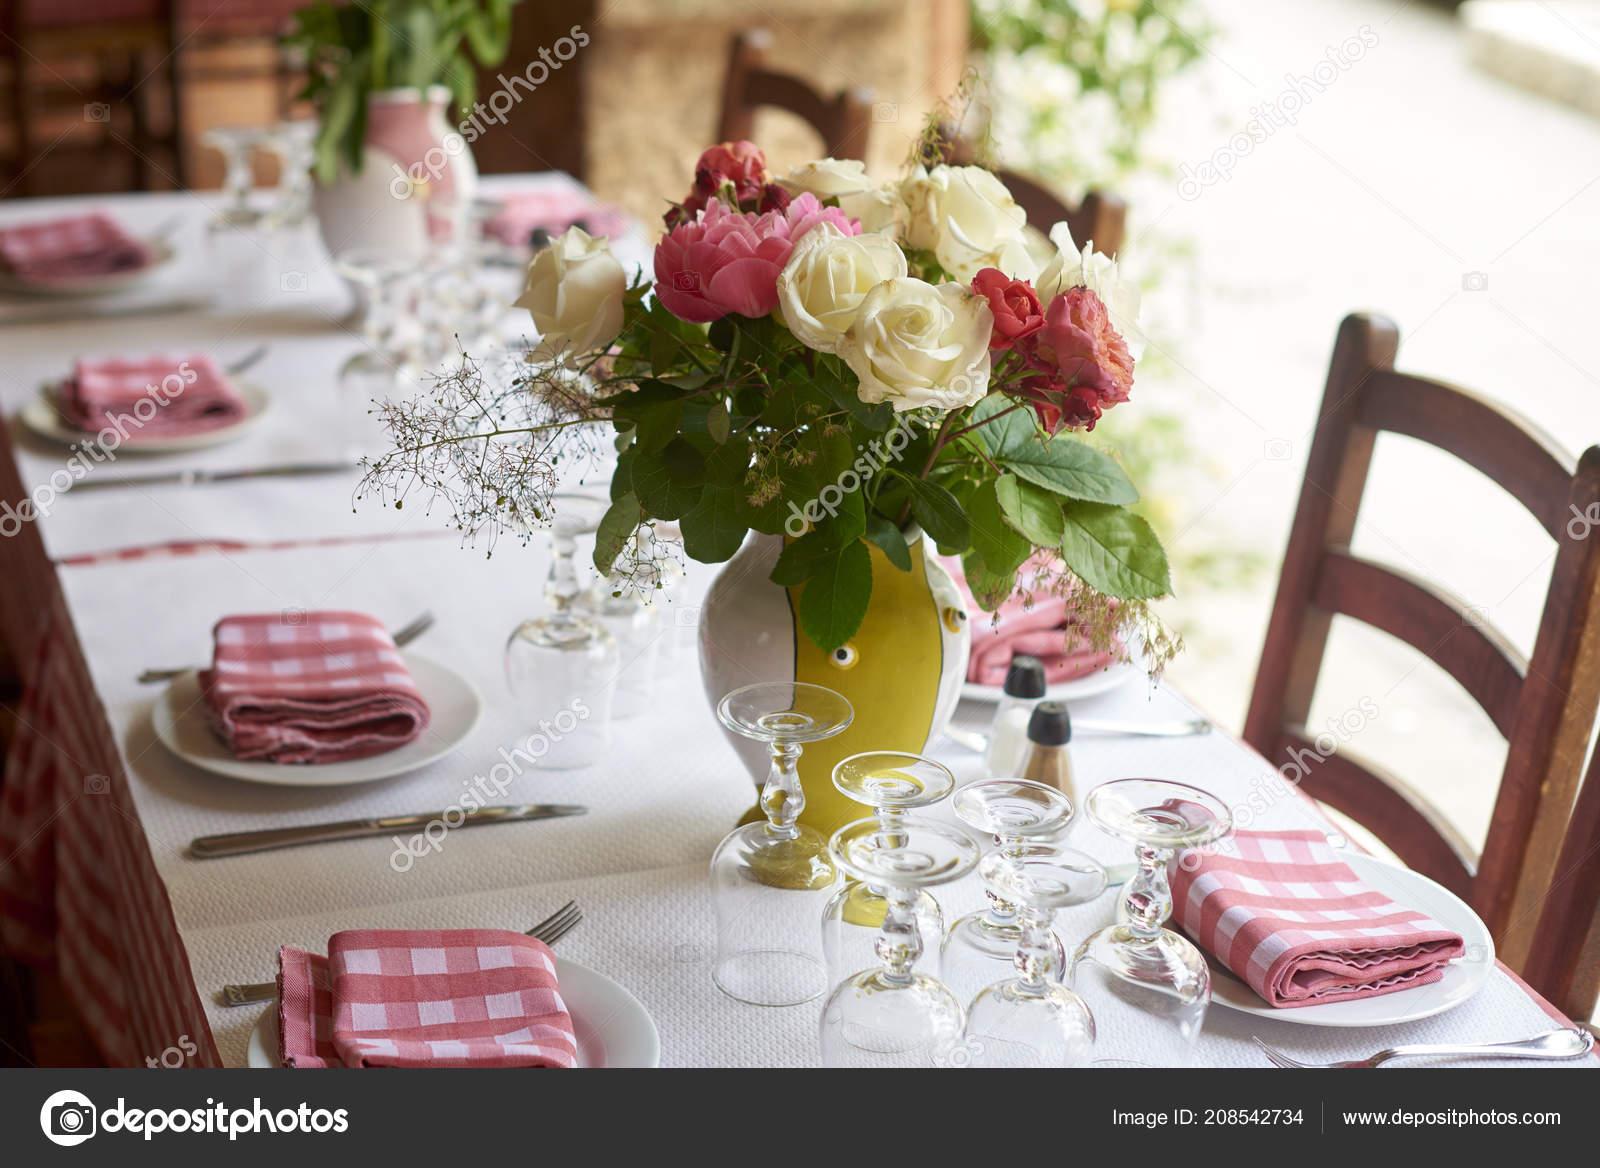 Shot Table Set Meal Restaurant Outdoor Terrace Stock Photo C Gzorgz 208542734